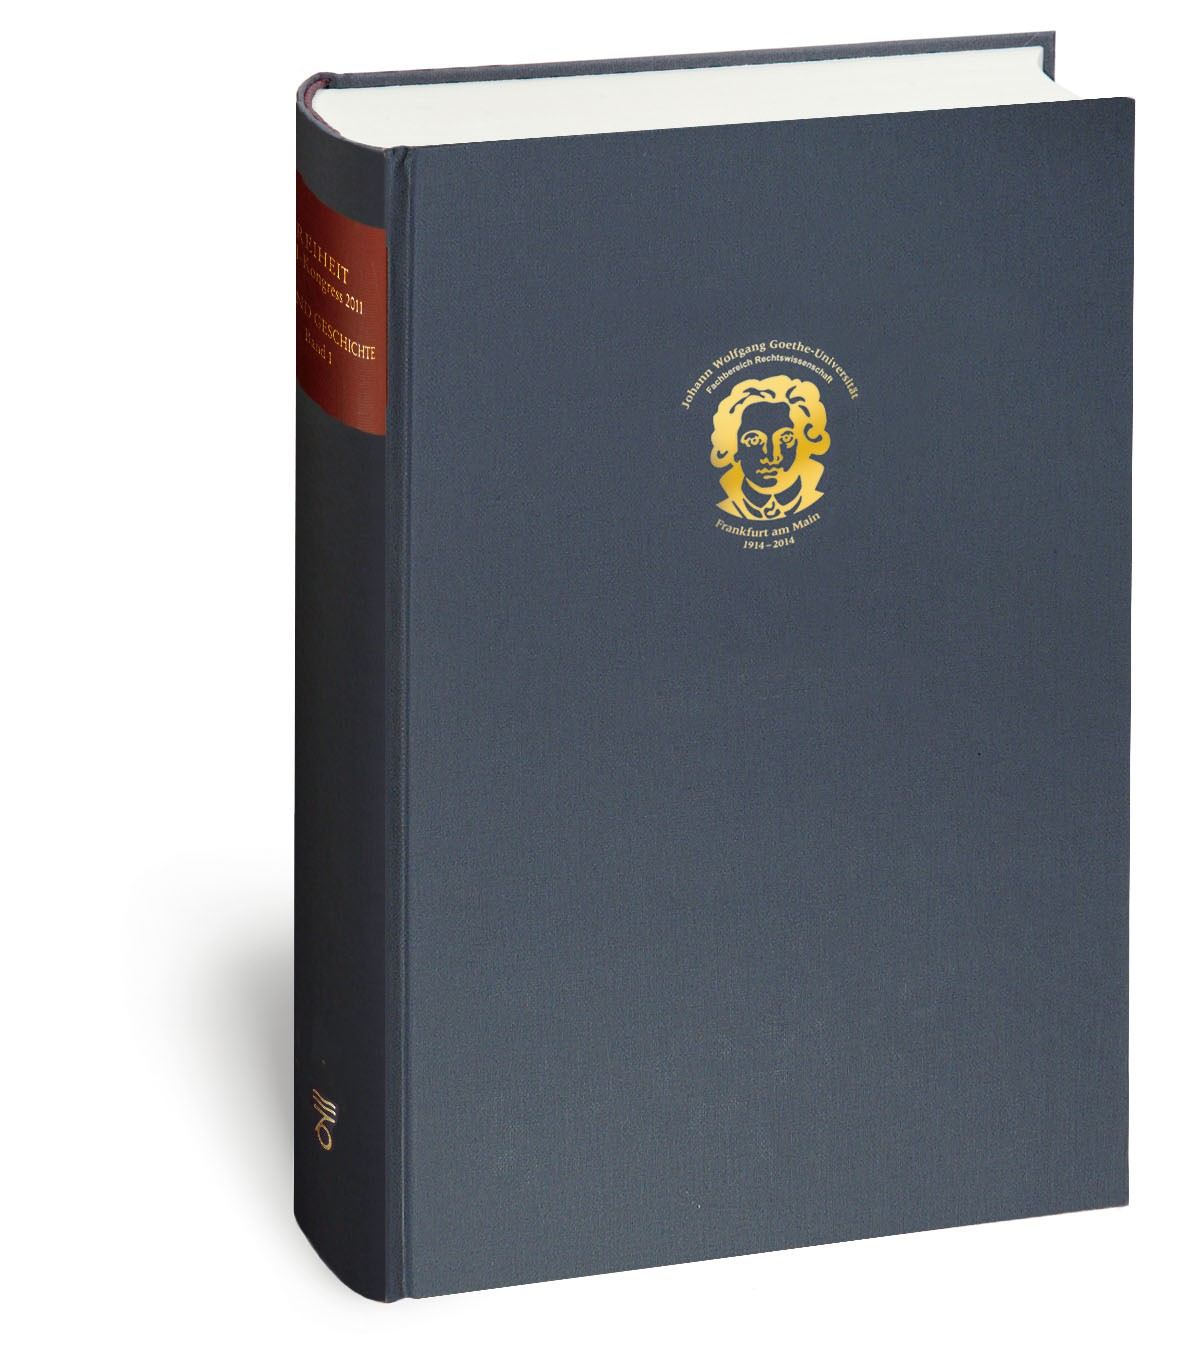 100 Jahre Rechtswissenschaft in Frankfurt | 1., 2014, 2014 | Buch (Cover)